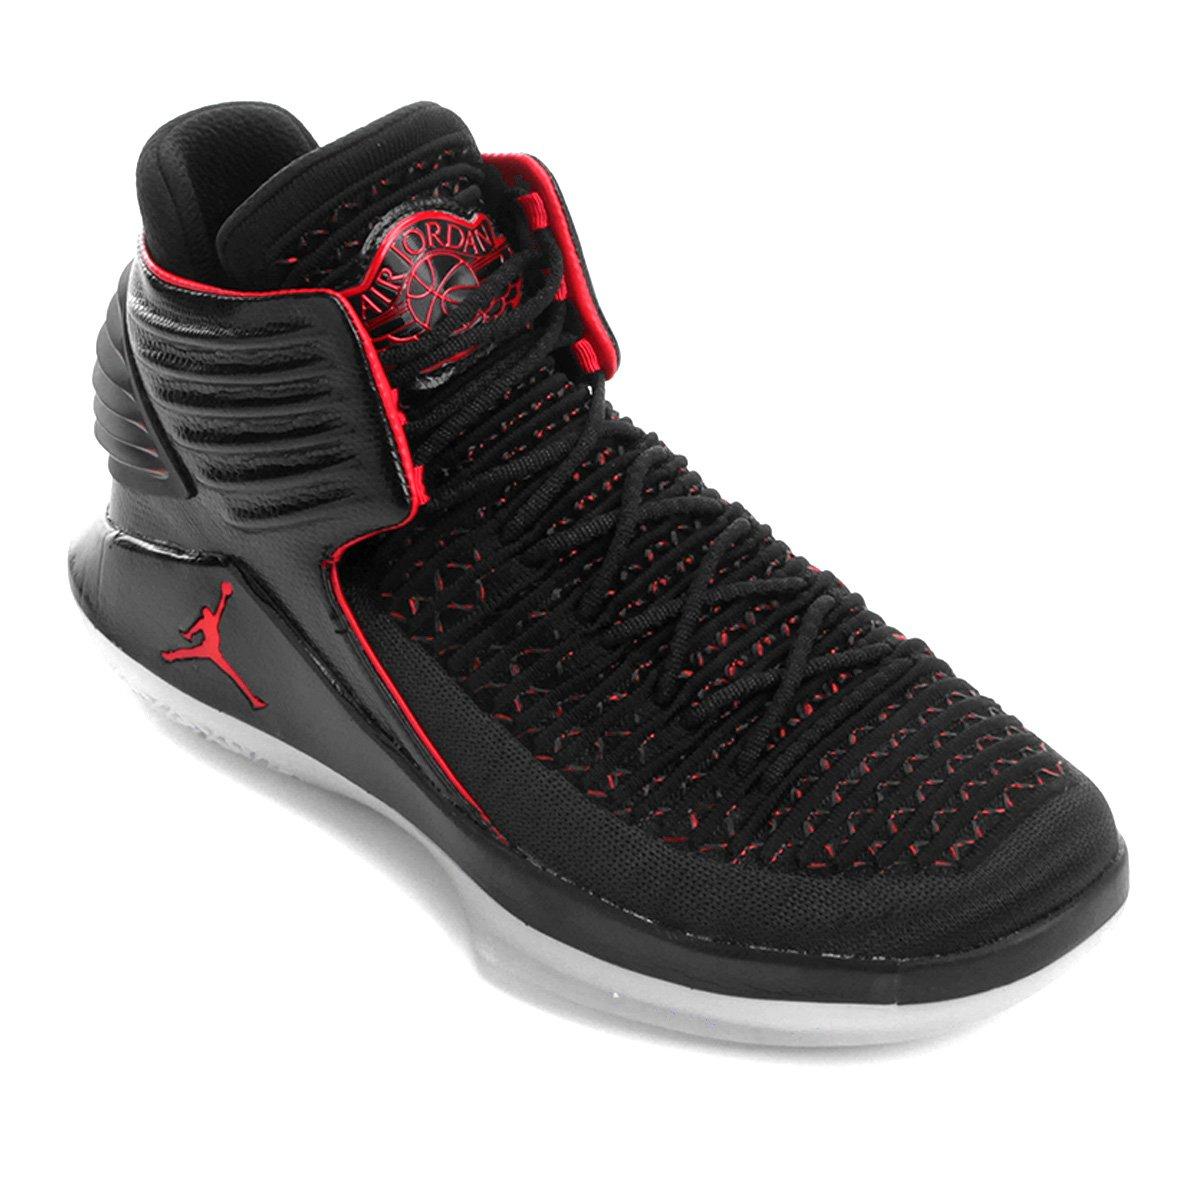 Jordan Xxxii Air Tênis Nba Nike Compre Loja Agora Masculino ZqpwUt